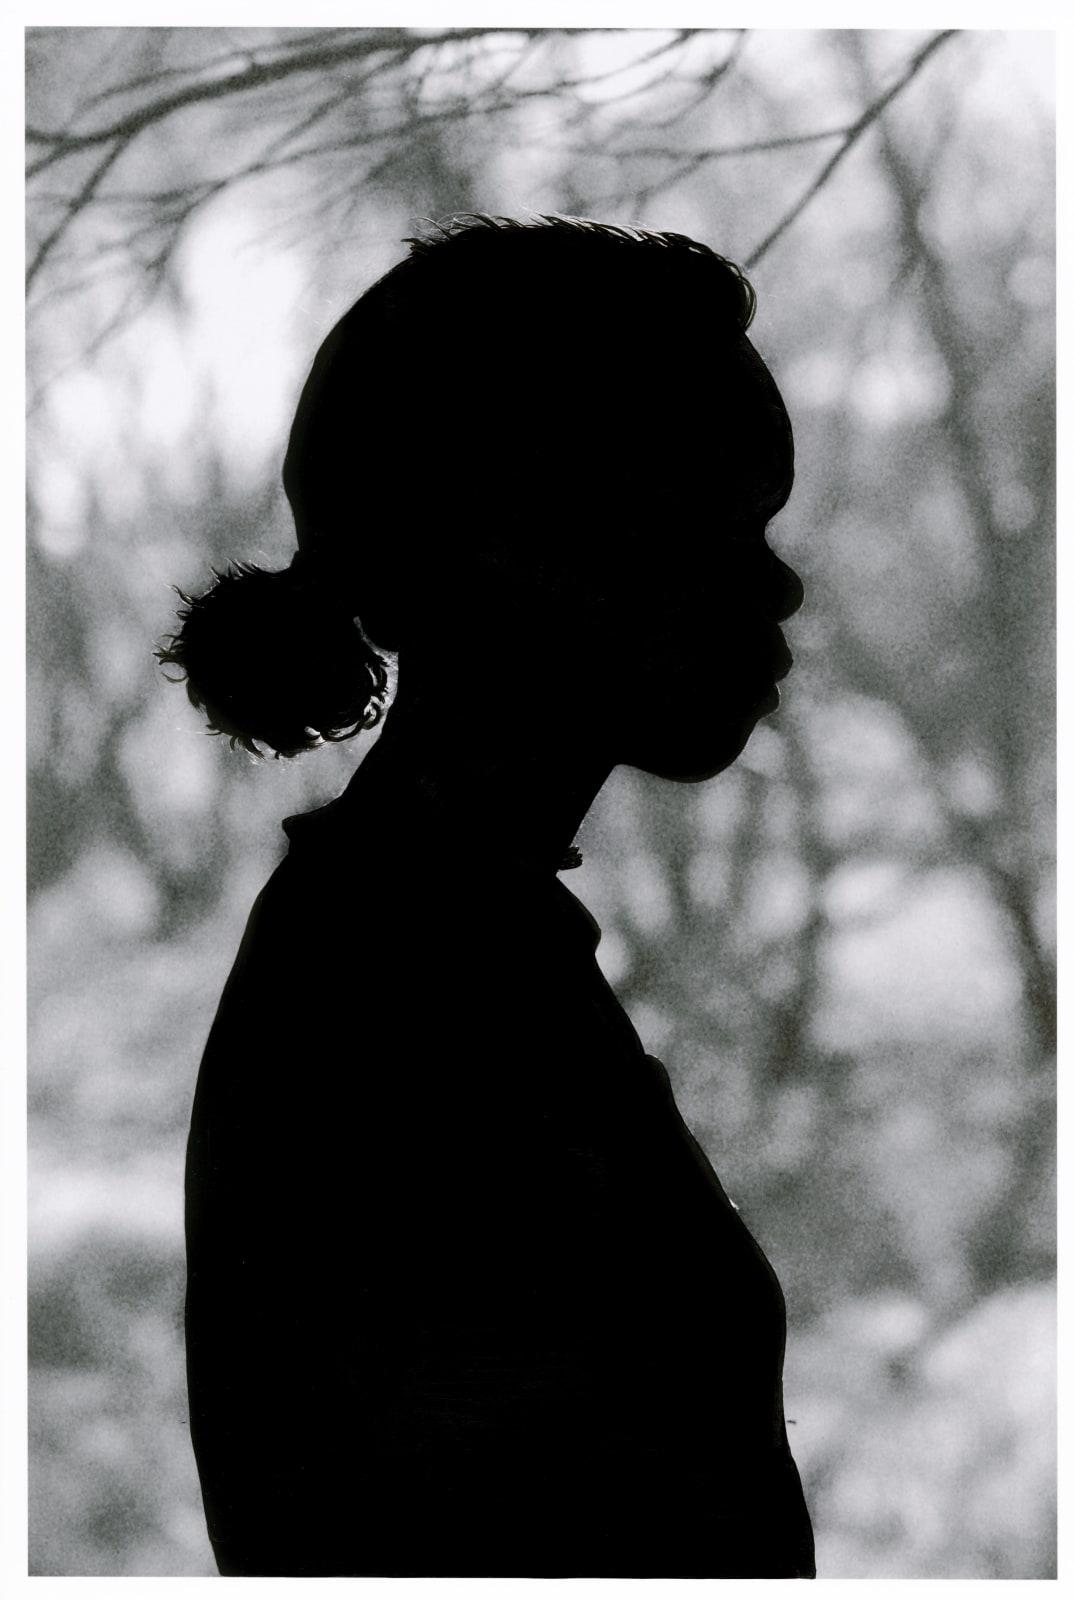 Patrick Waterhouse, Restricted Side Portrait Right, 2014 - 2018